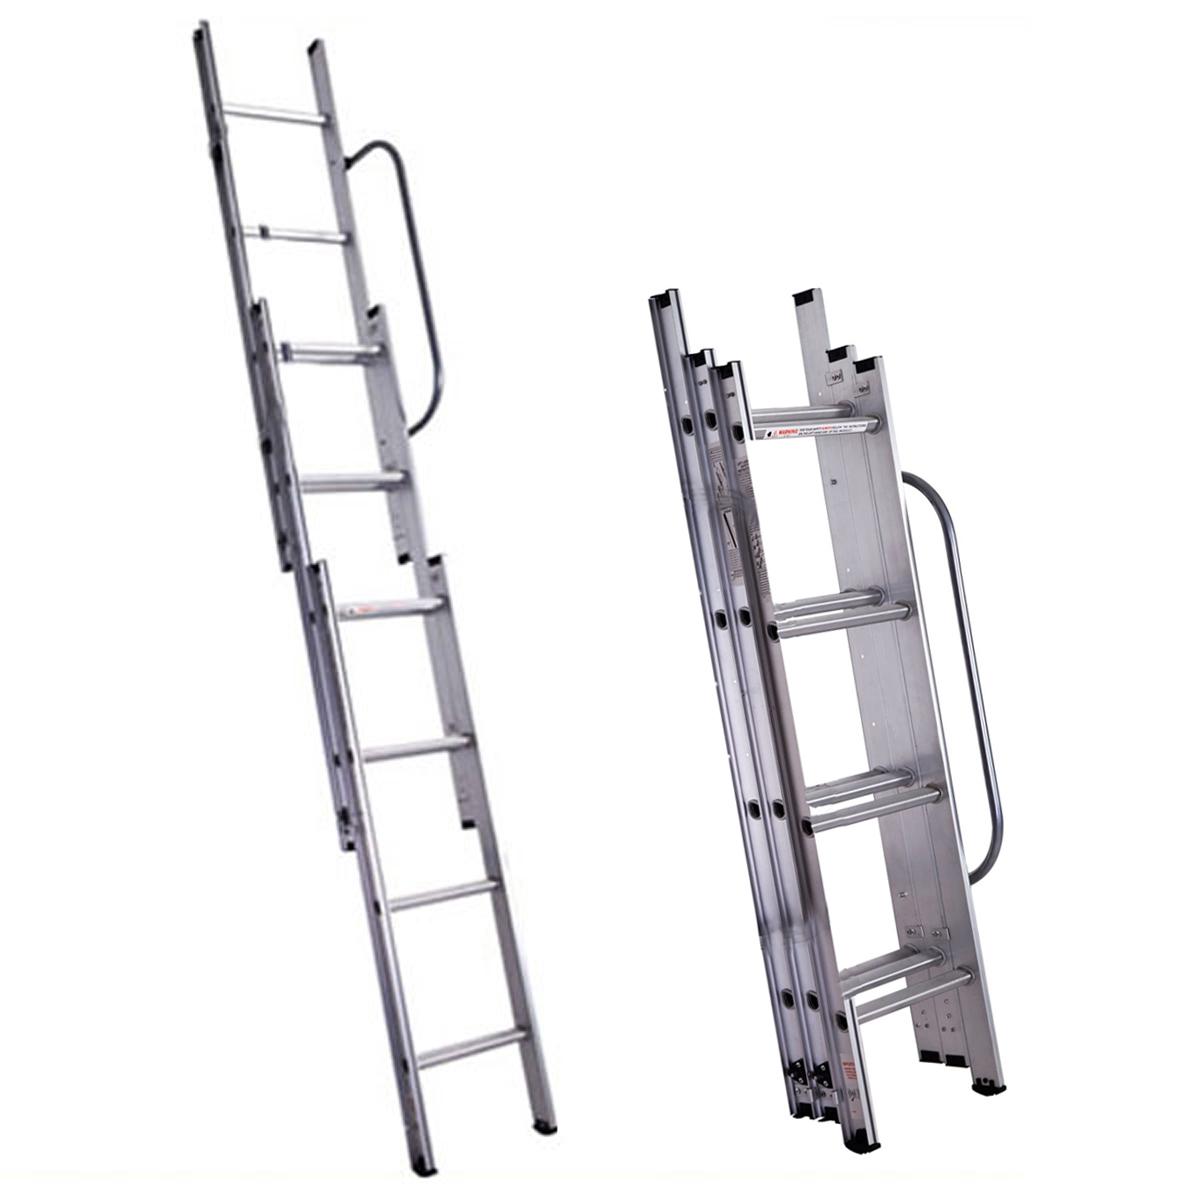 Folding Extension Ladder : Telescoping ladder deals on blocks